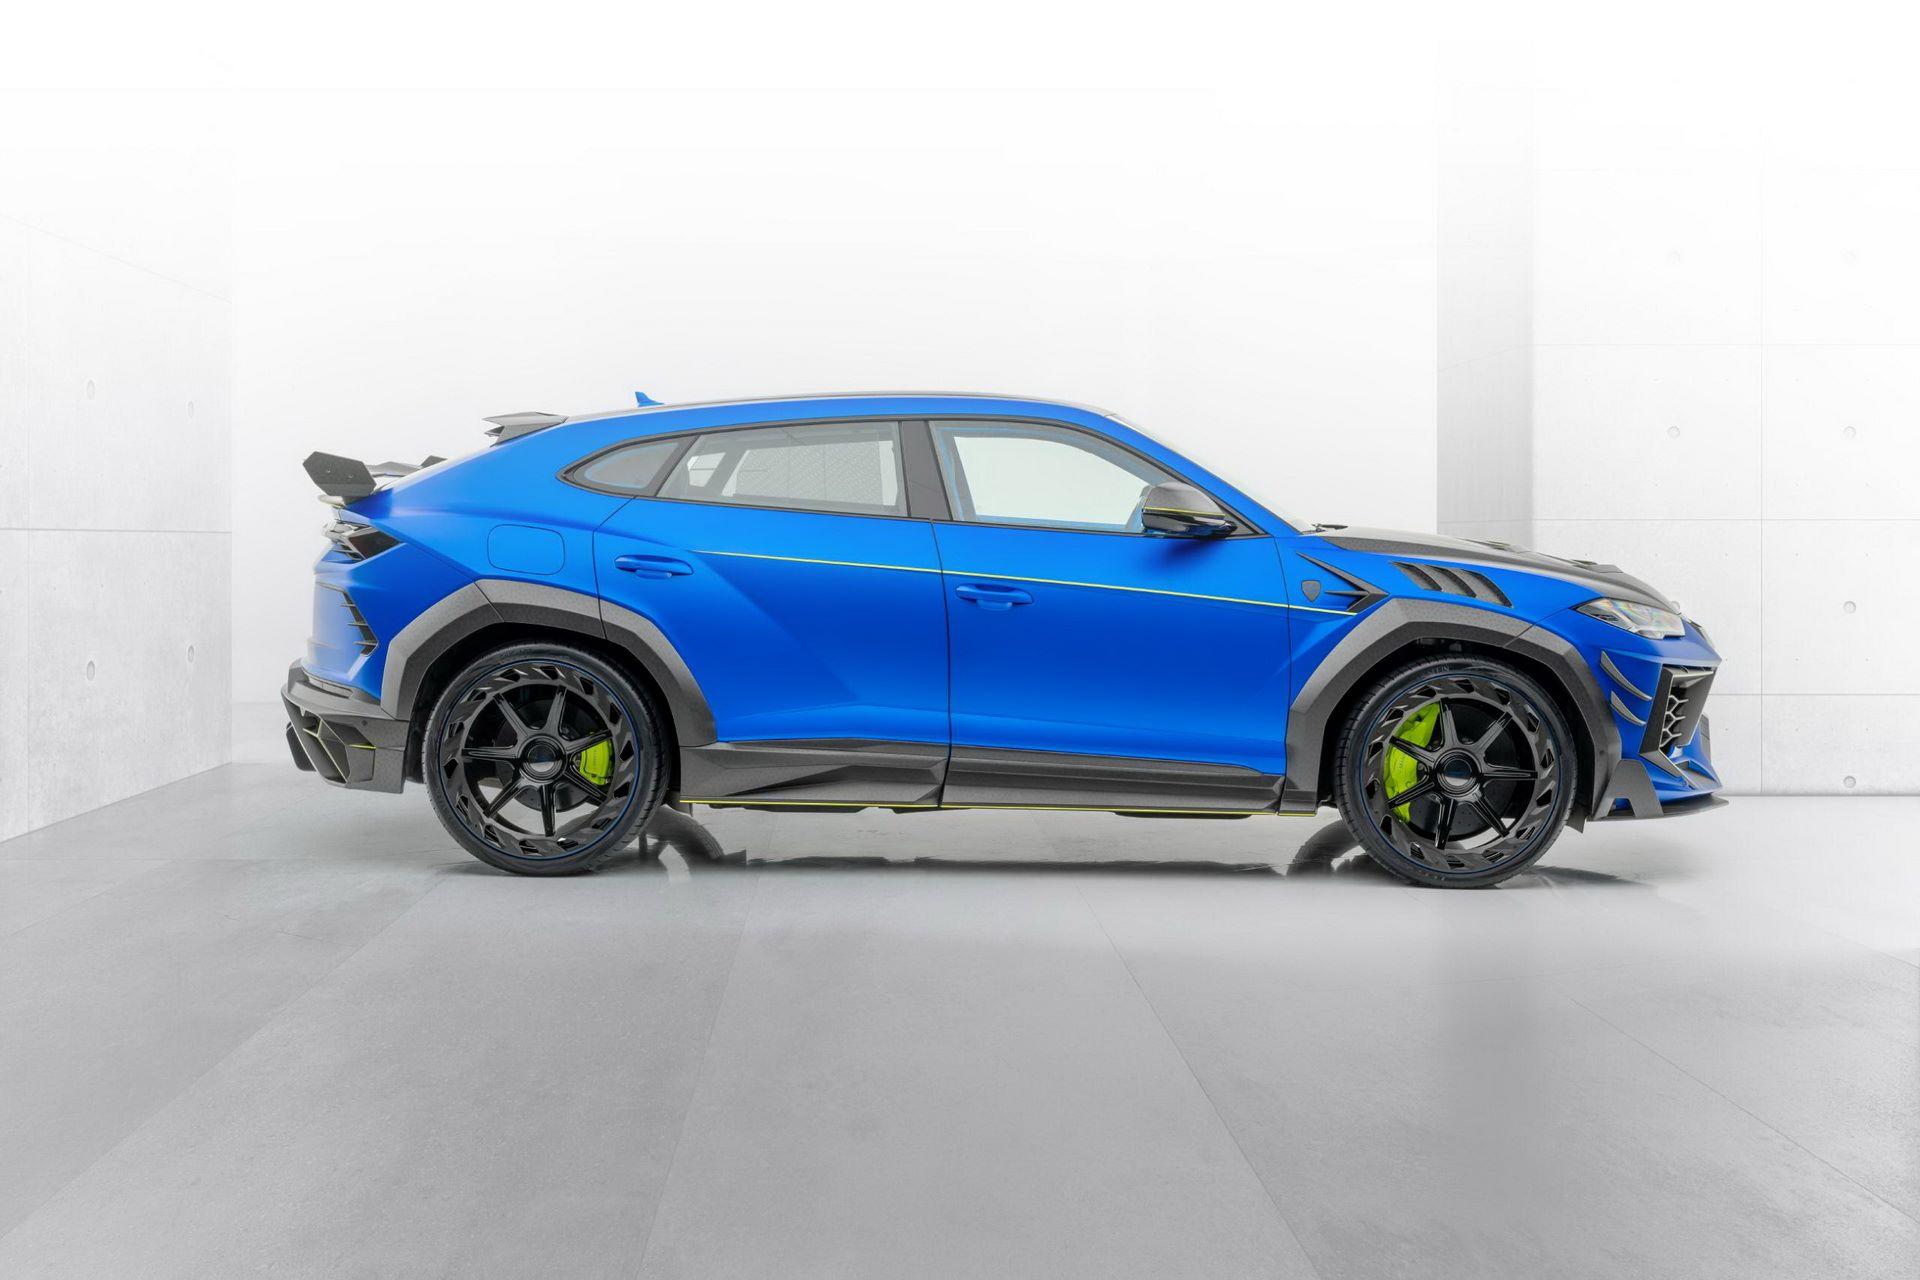 Lamborghini-Urus-Mansory-Venatus-5